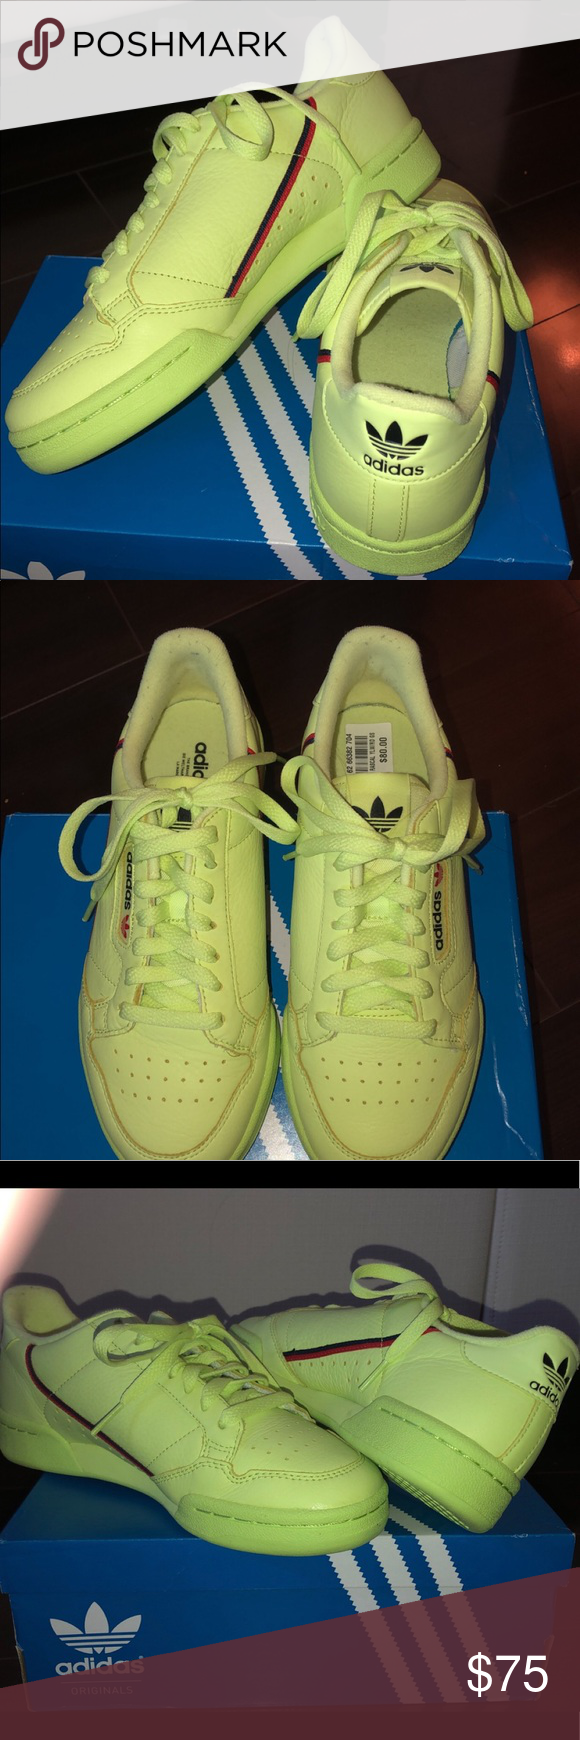 Shoes sneakers adidas, Adidas, Adidas women